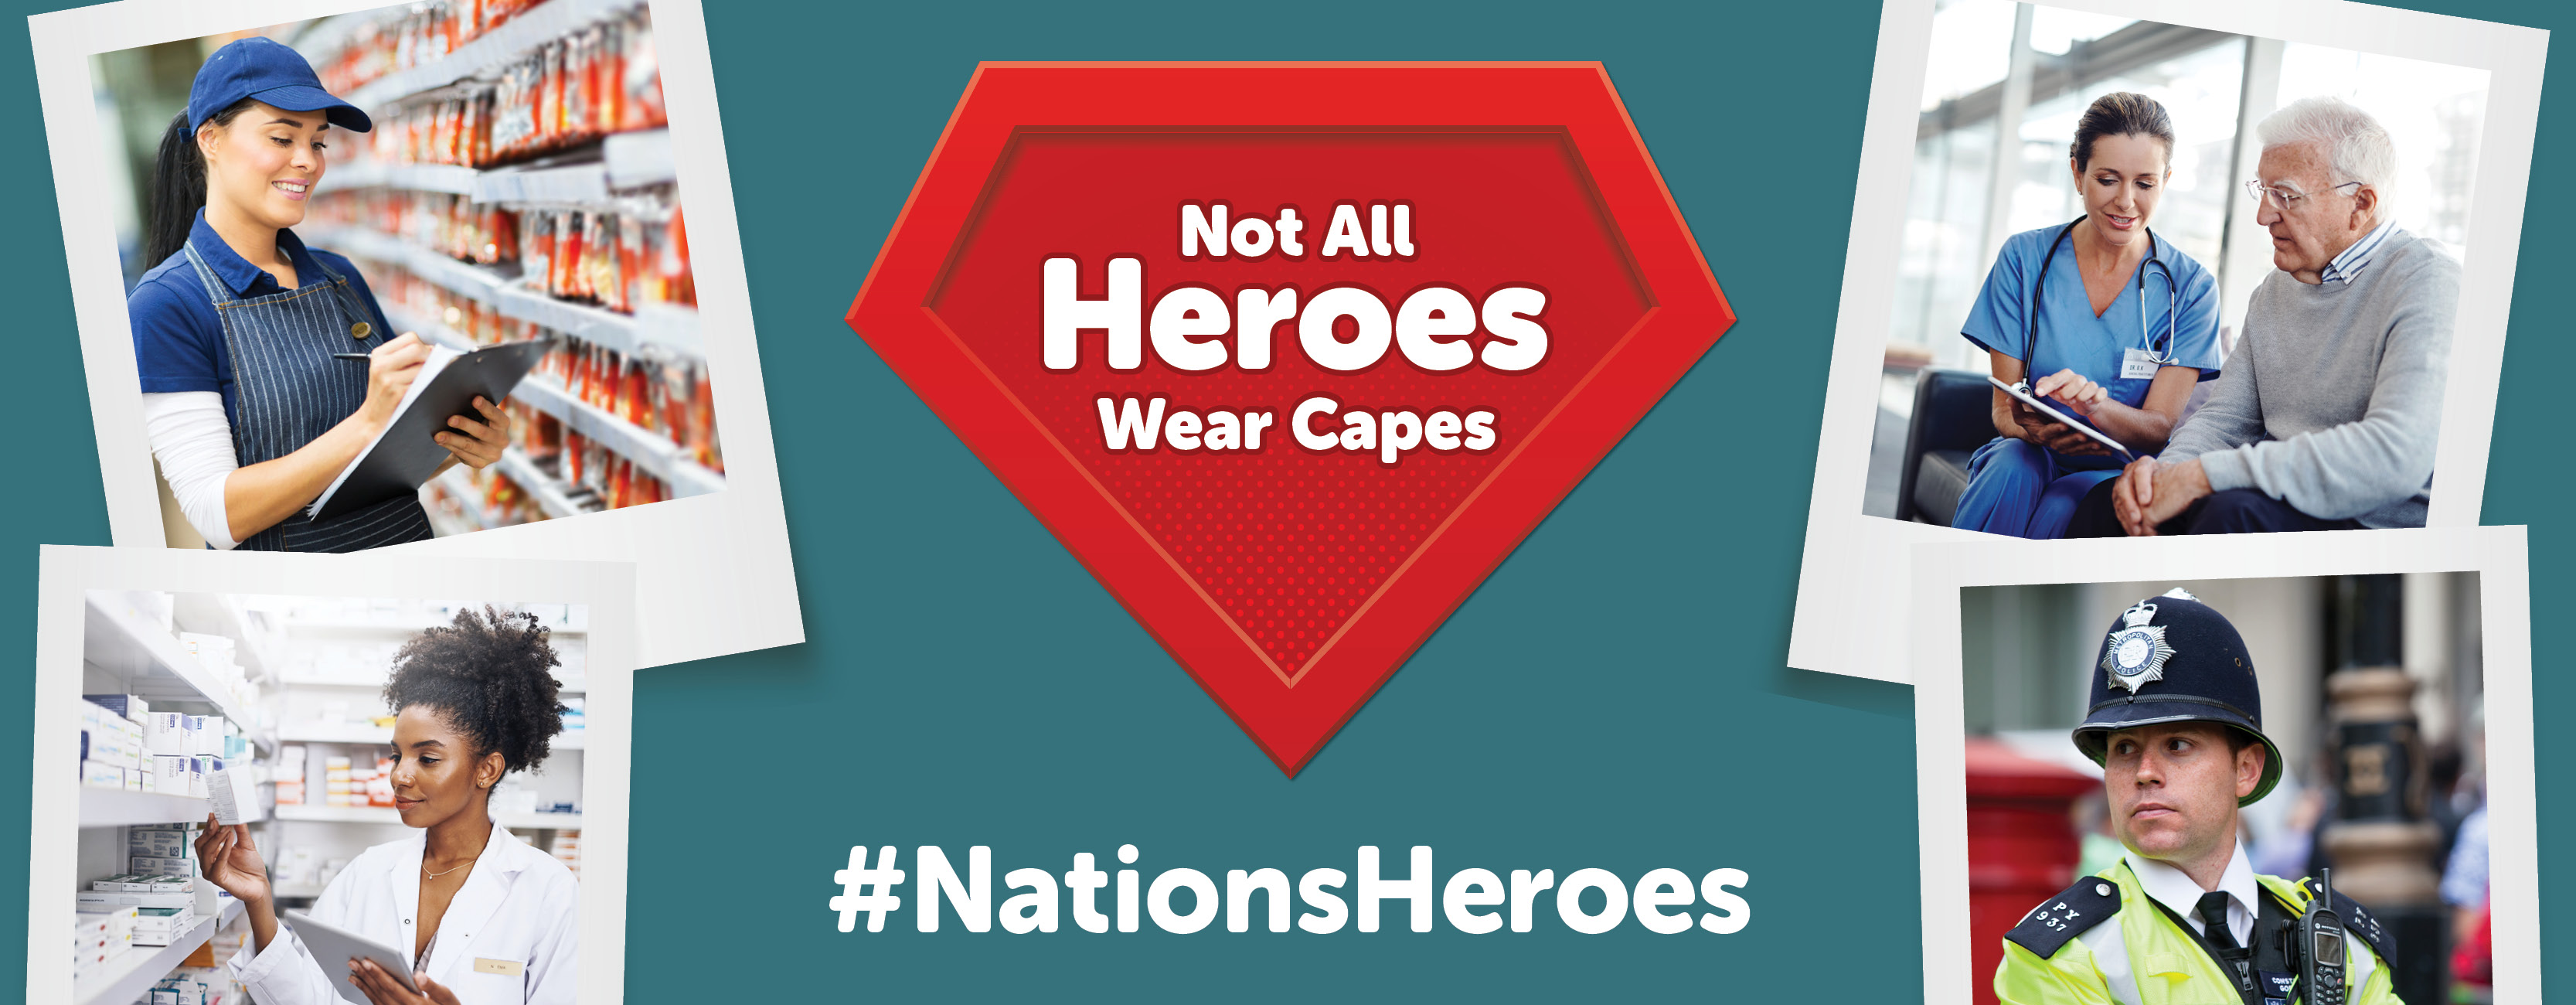 #NationsHeroes